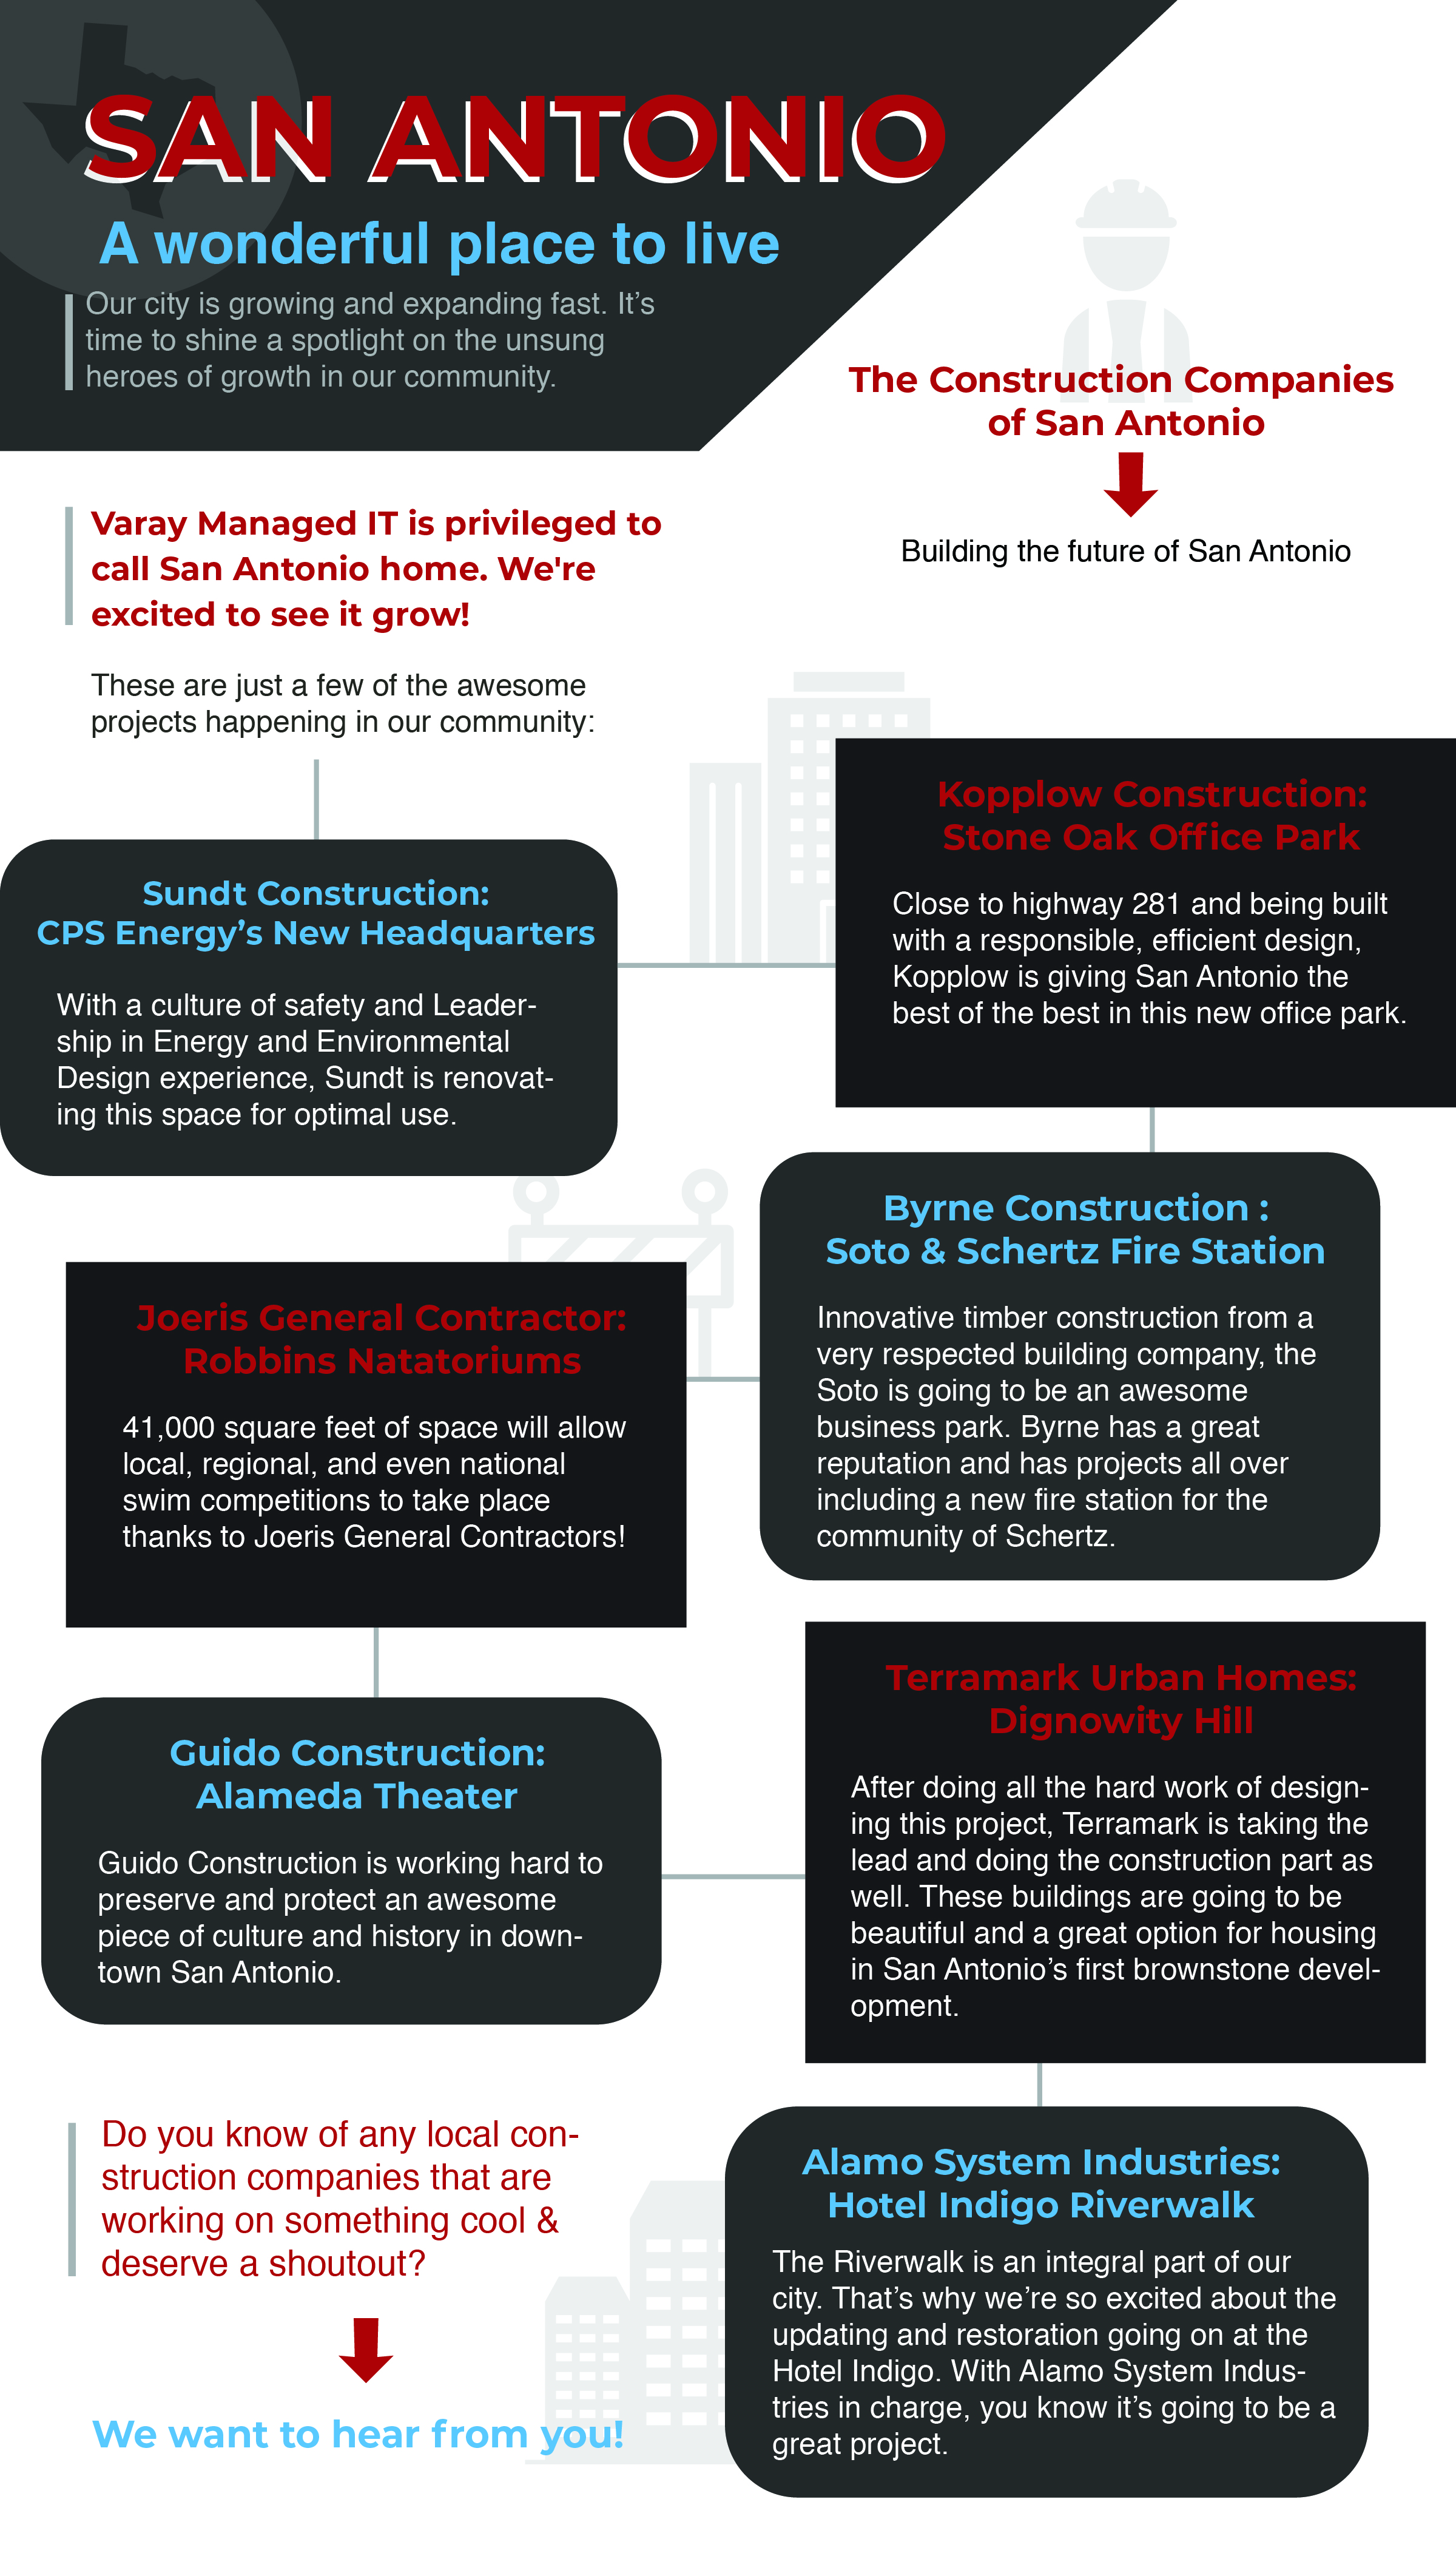 san-antonio-infographic-v4